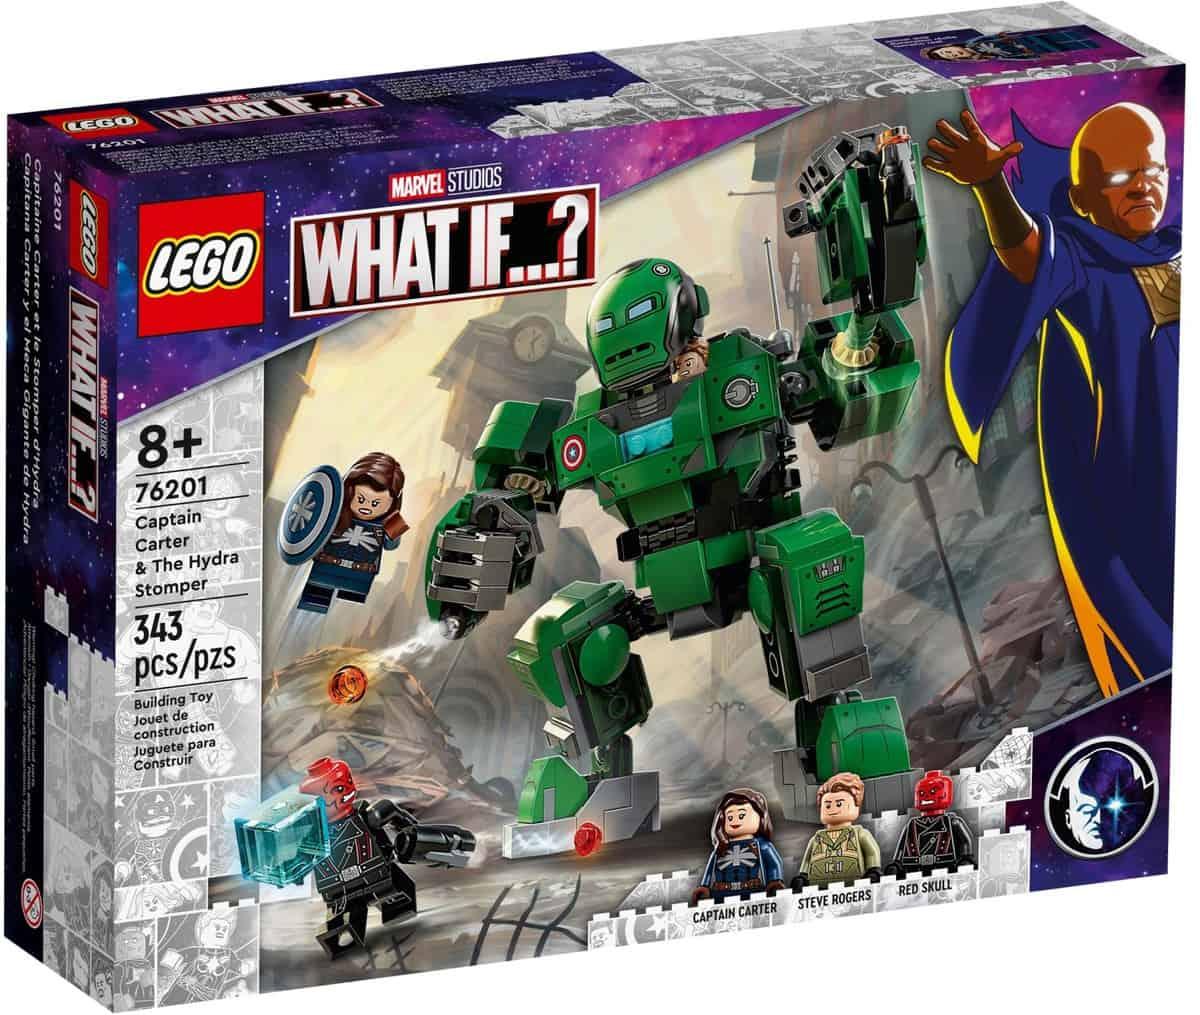 LEGO 76201 Captain Carter & The Hydra Stomper - 20210702